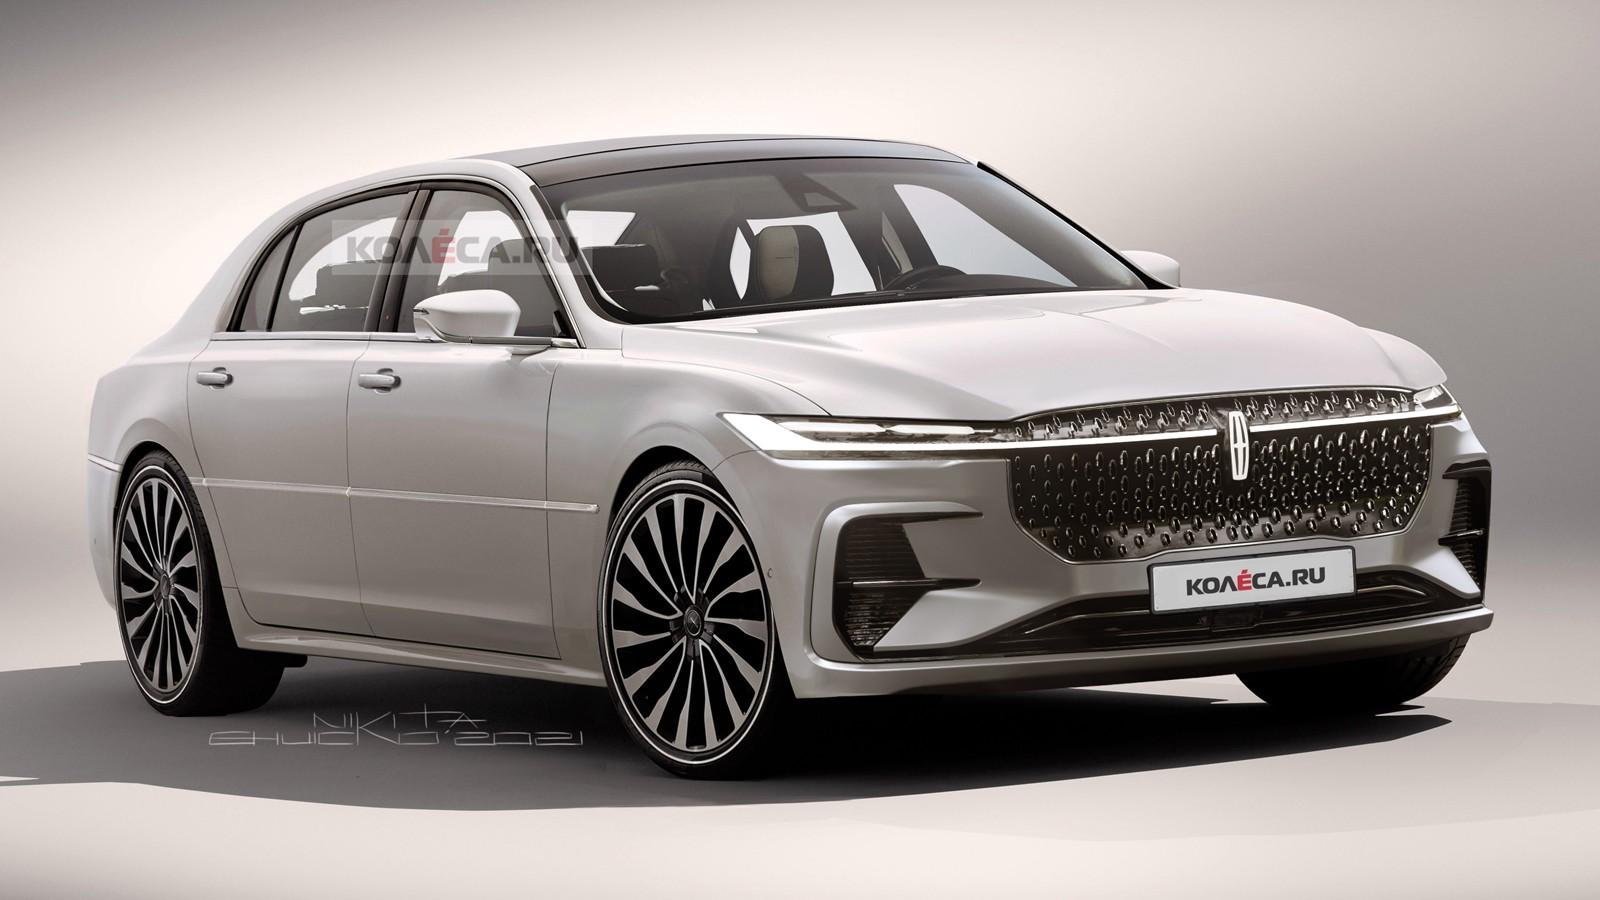 Новый Lincoln Town Car: каким он может быть